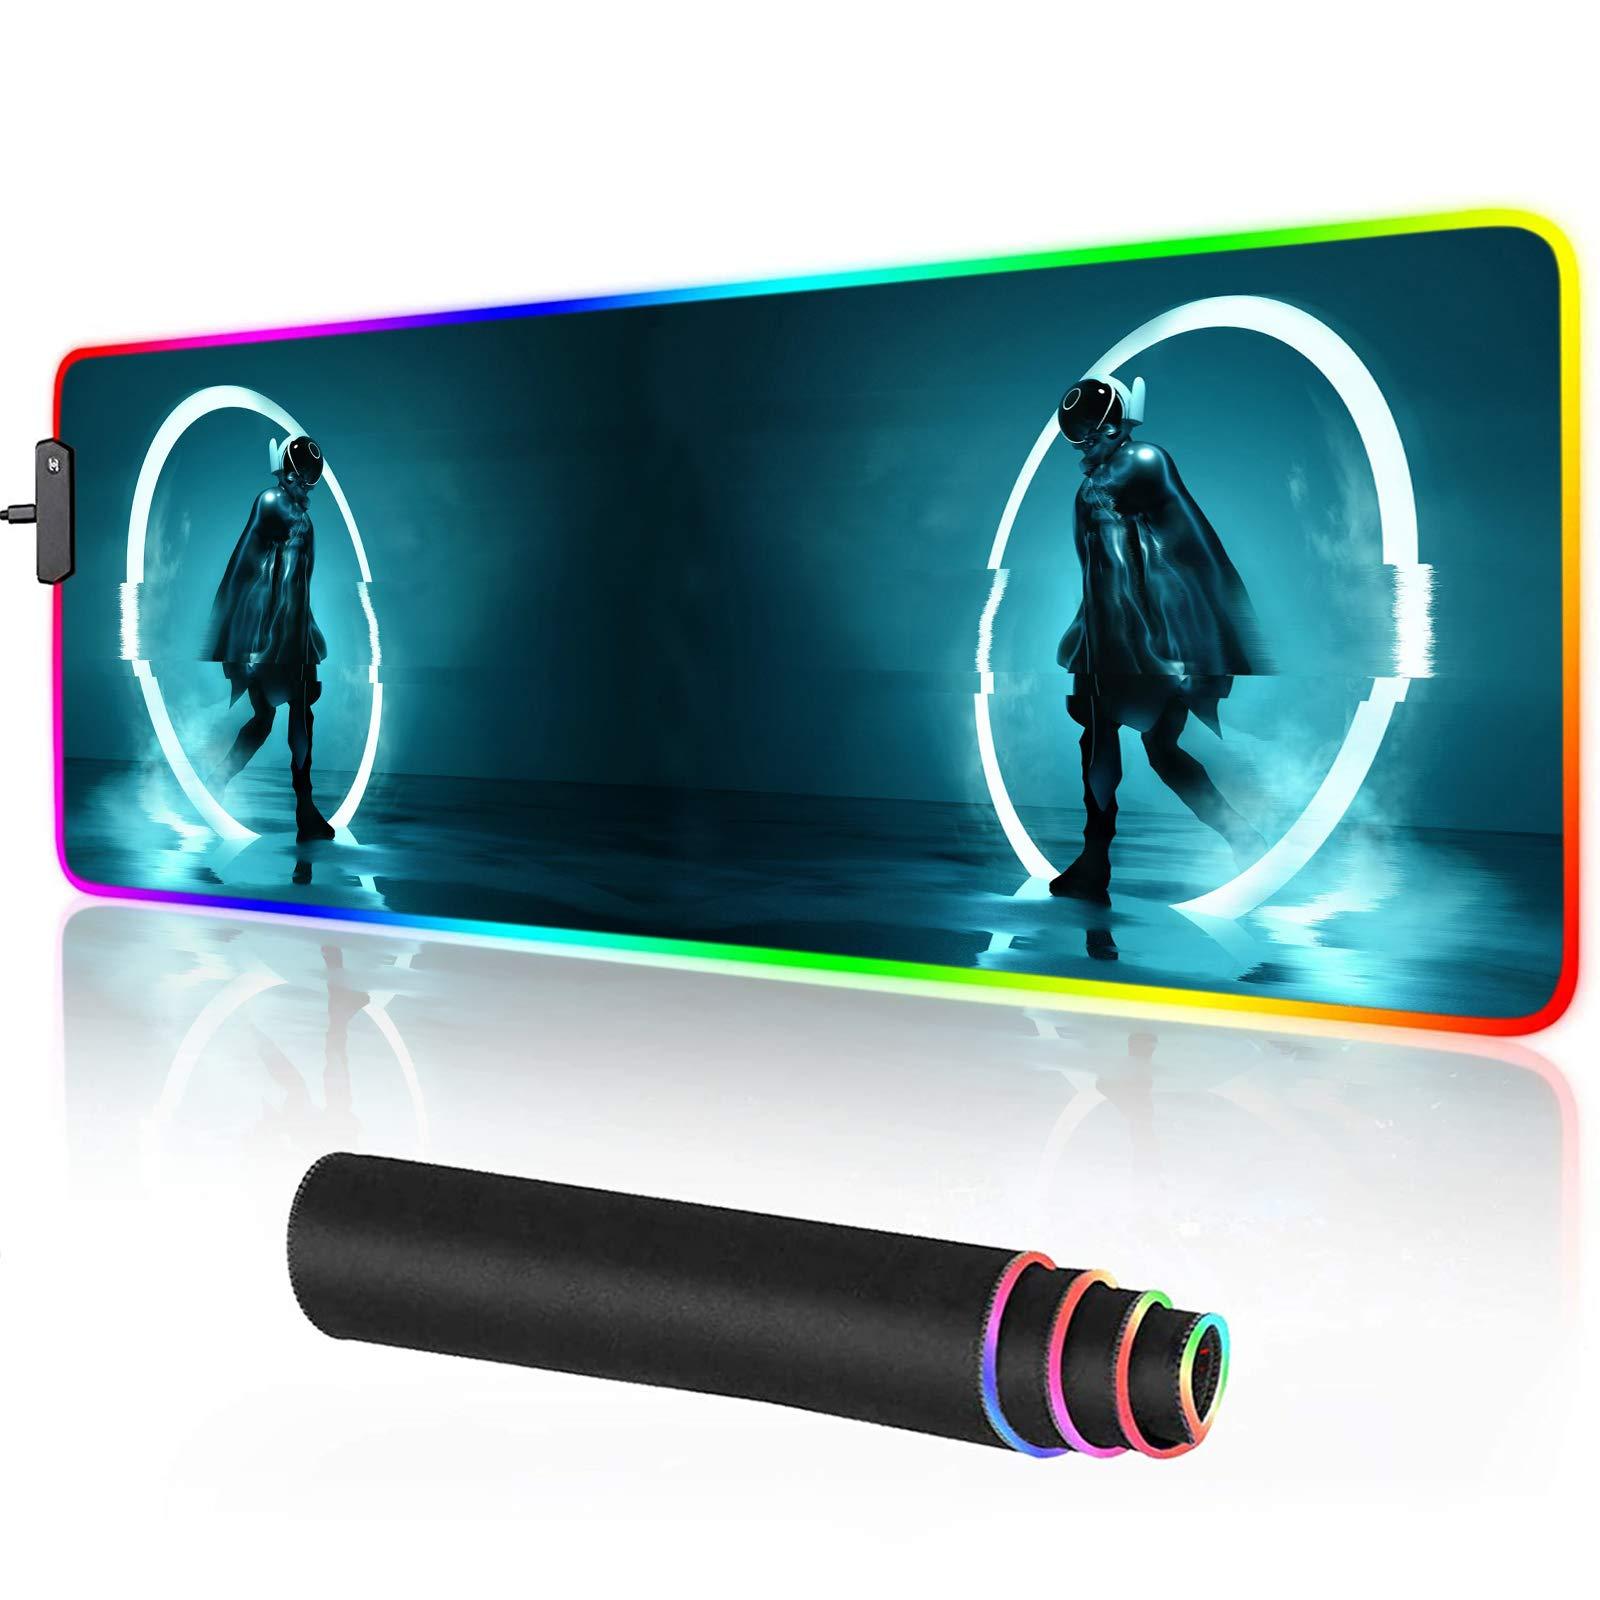 Mouse Pad RGB Gamer Antideslizante UZHOPM -8MVNBD4Q